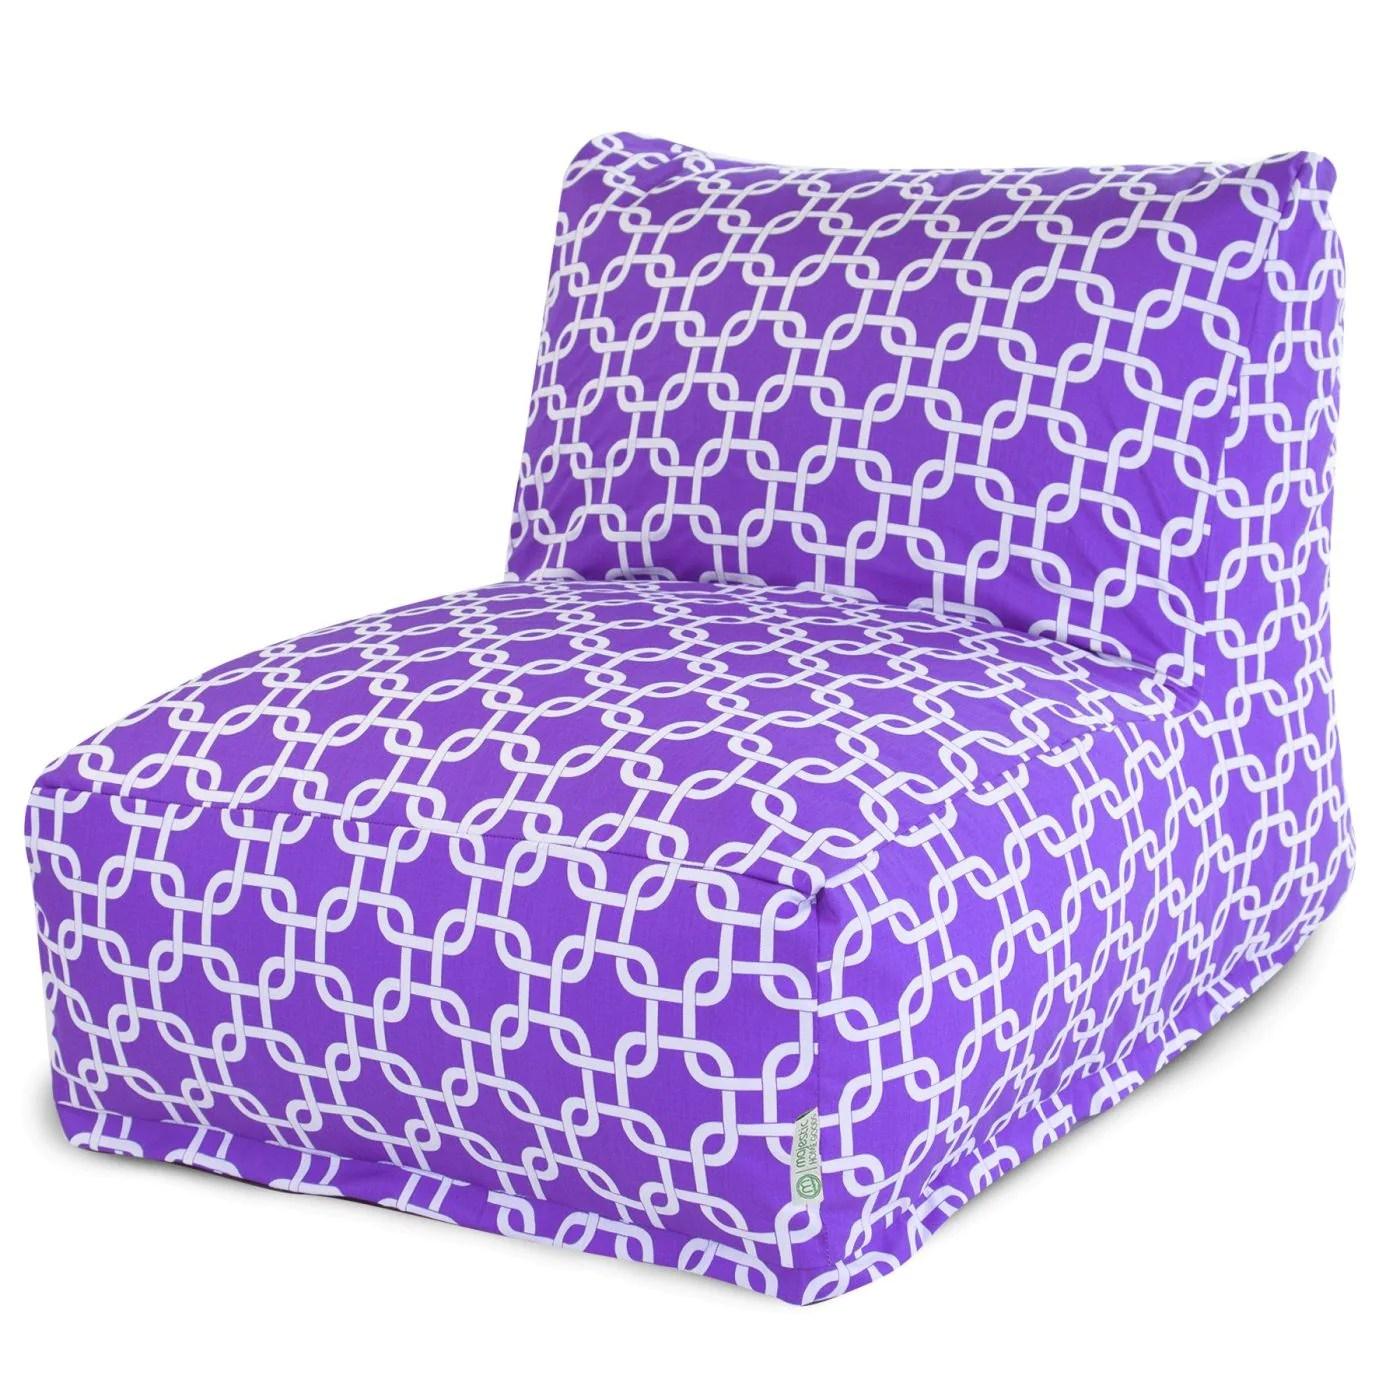 purple bean bag chair retro metal patio chairs majestic home 85907220365 links lounger